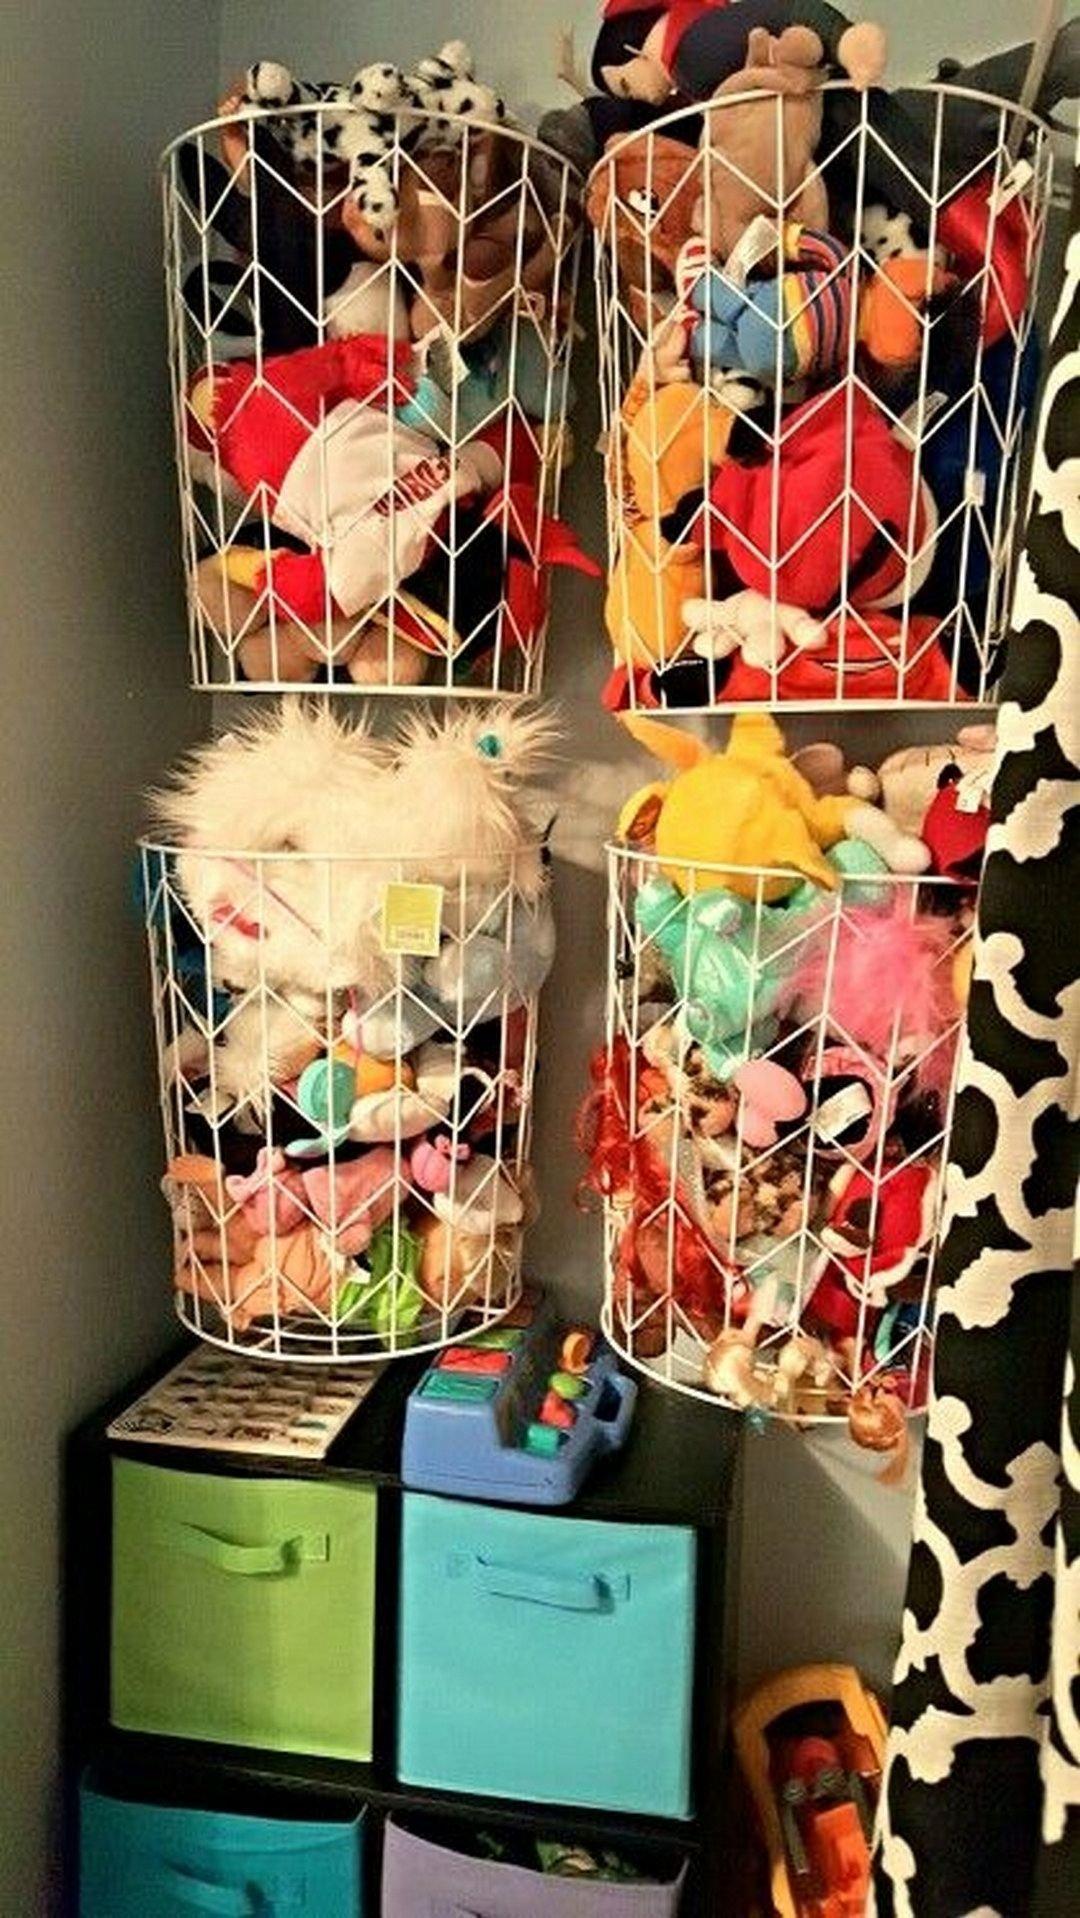 10 Spectacular Ideas For Stuffed Animal Storage 80 creative stuffed animals storage ideas creative toy storage 2021